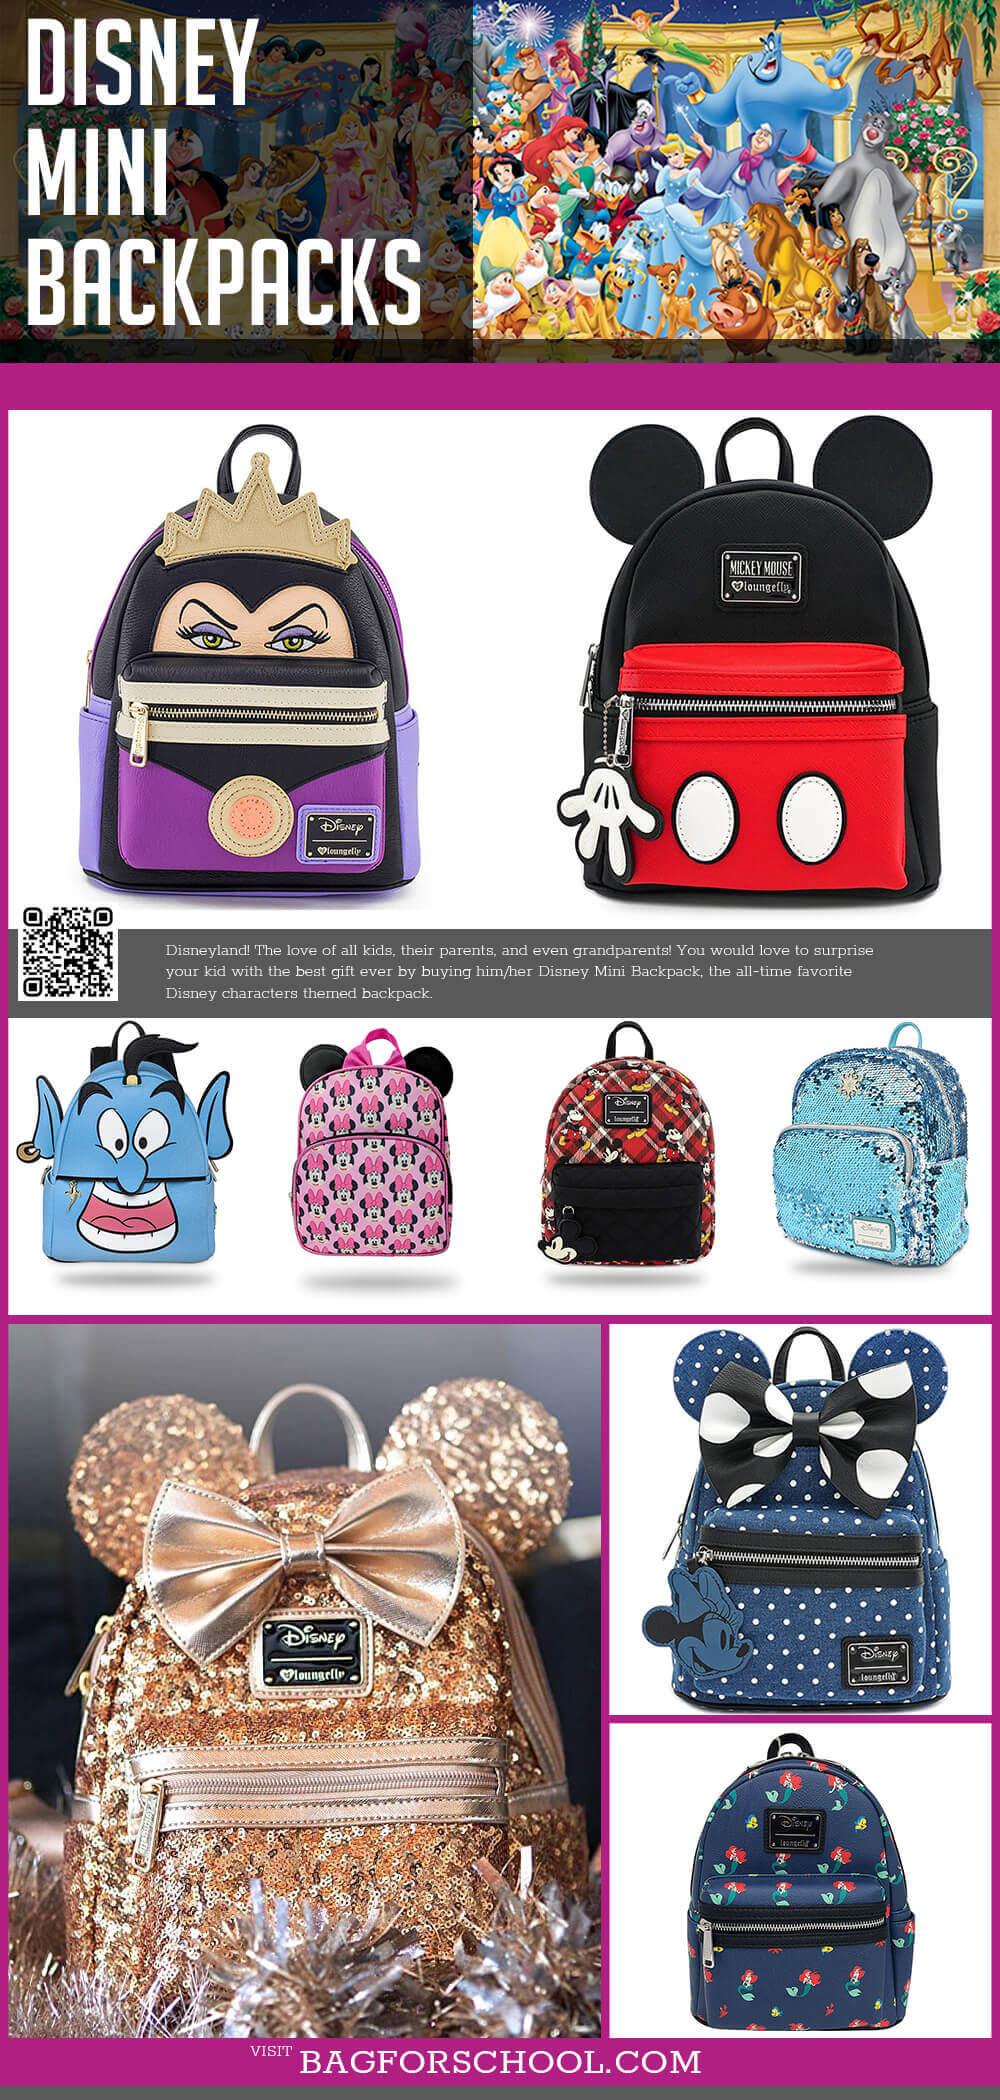 Disney Mini Backpacks